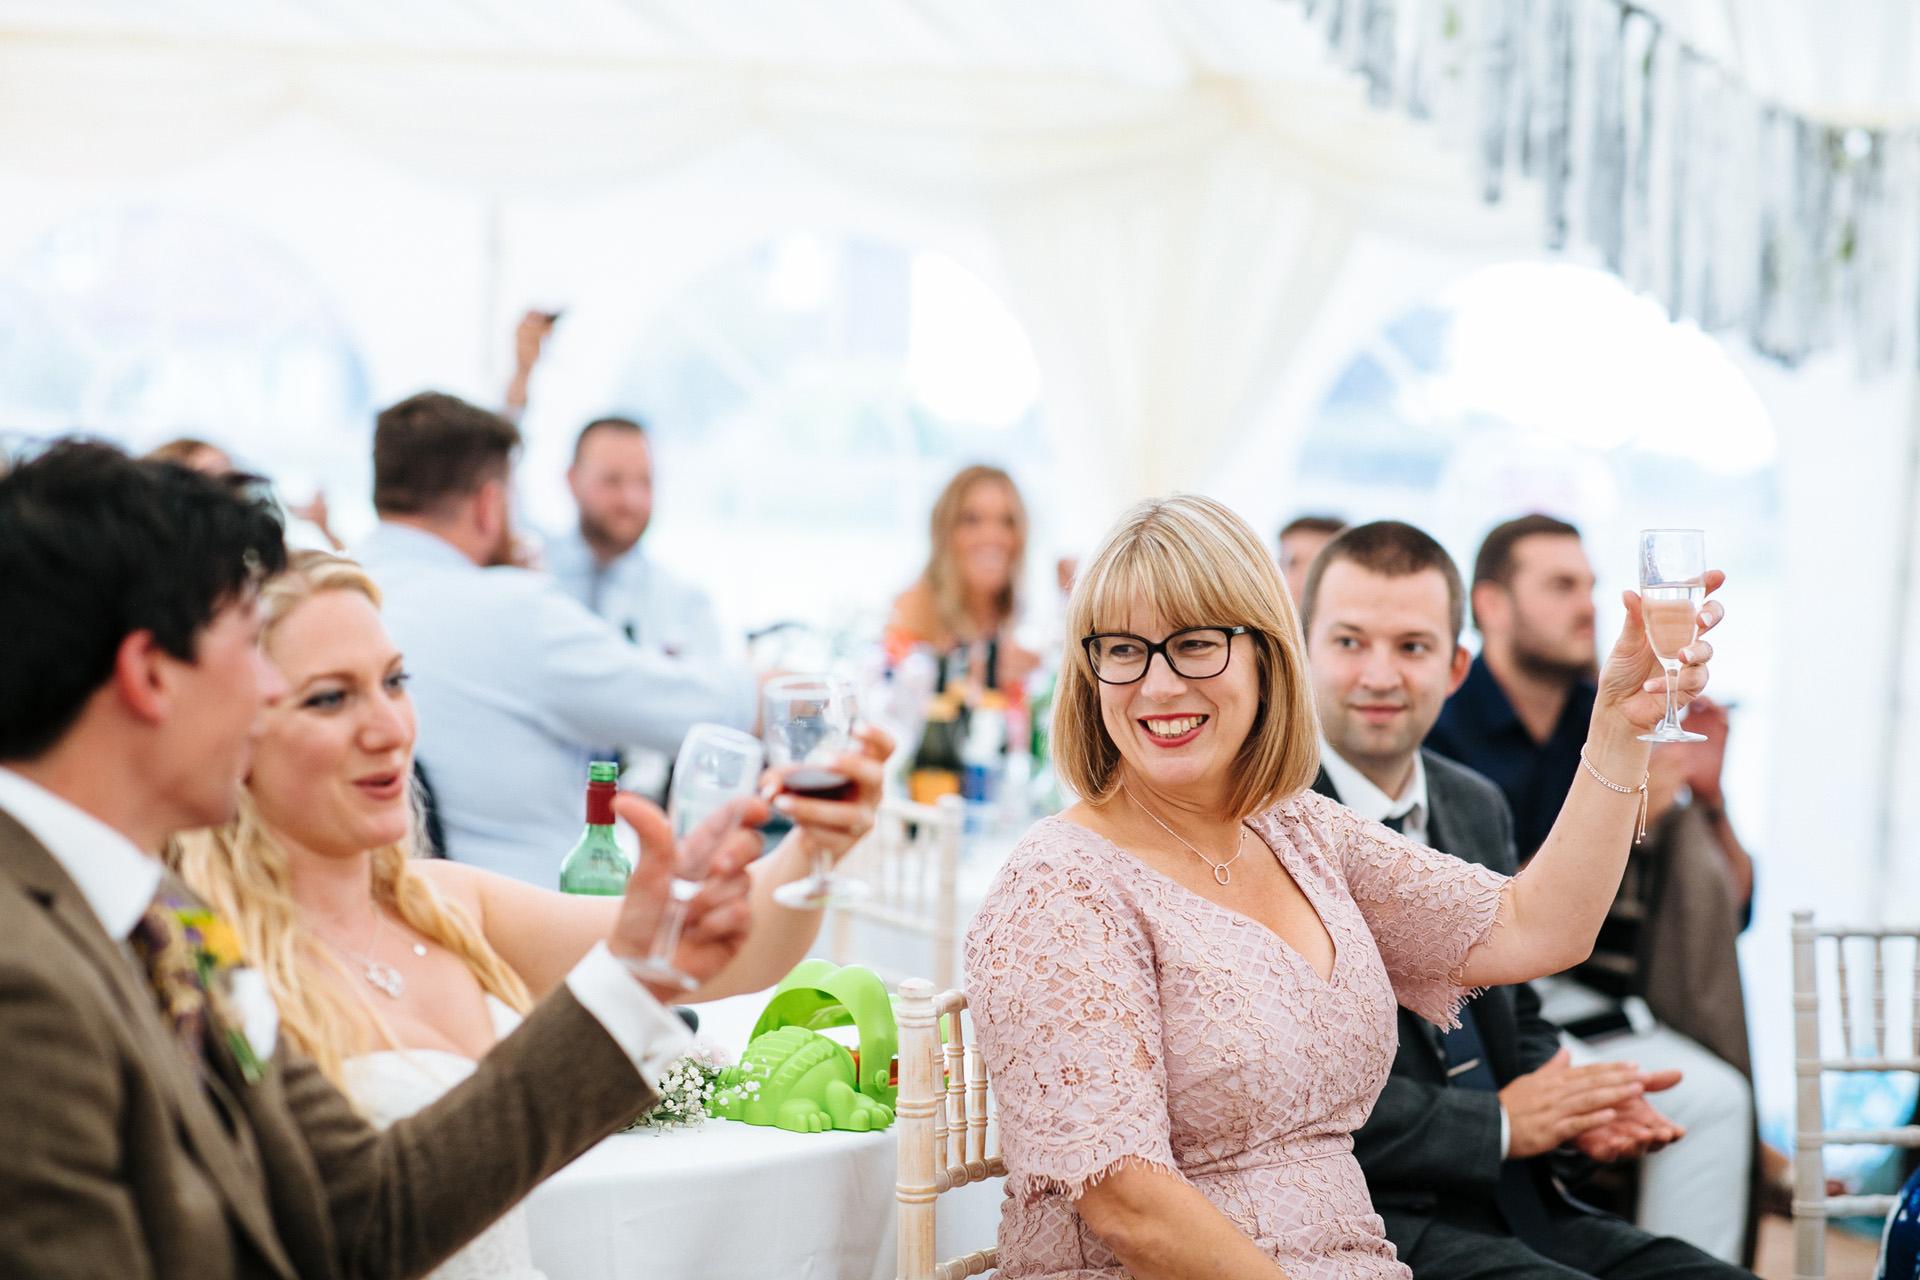 brides mum toasting her glass during speeches